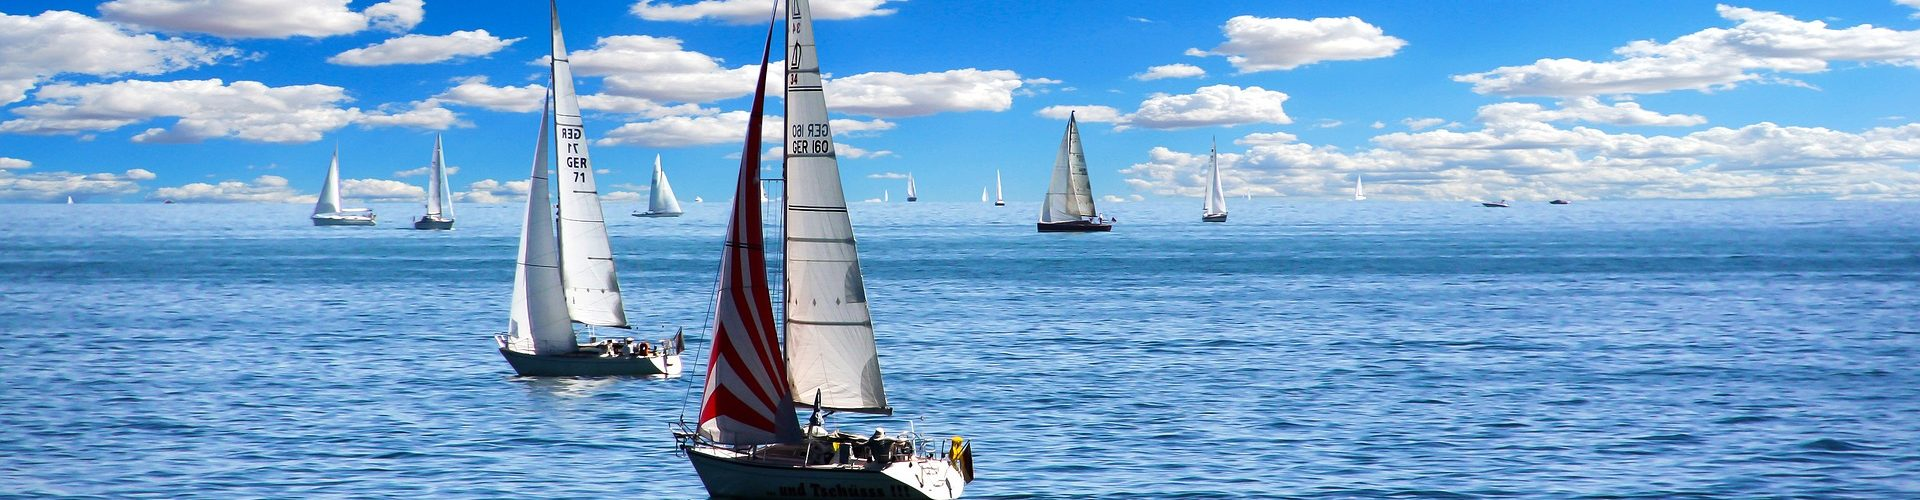 segeln lernen in SaalfeldSaale segelschein machen in SaalfeldSaale 1920x500 - Segeln lernen in Saalfeld/Saale